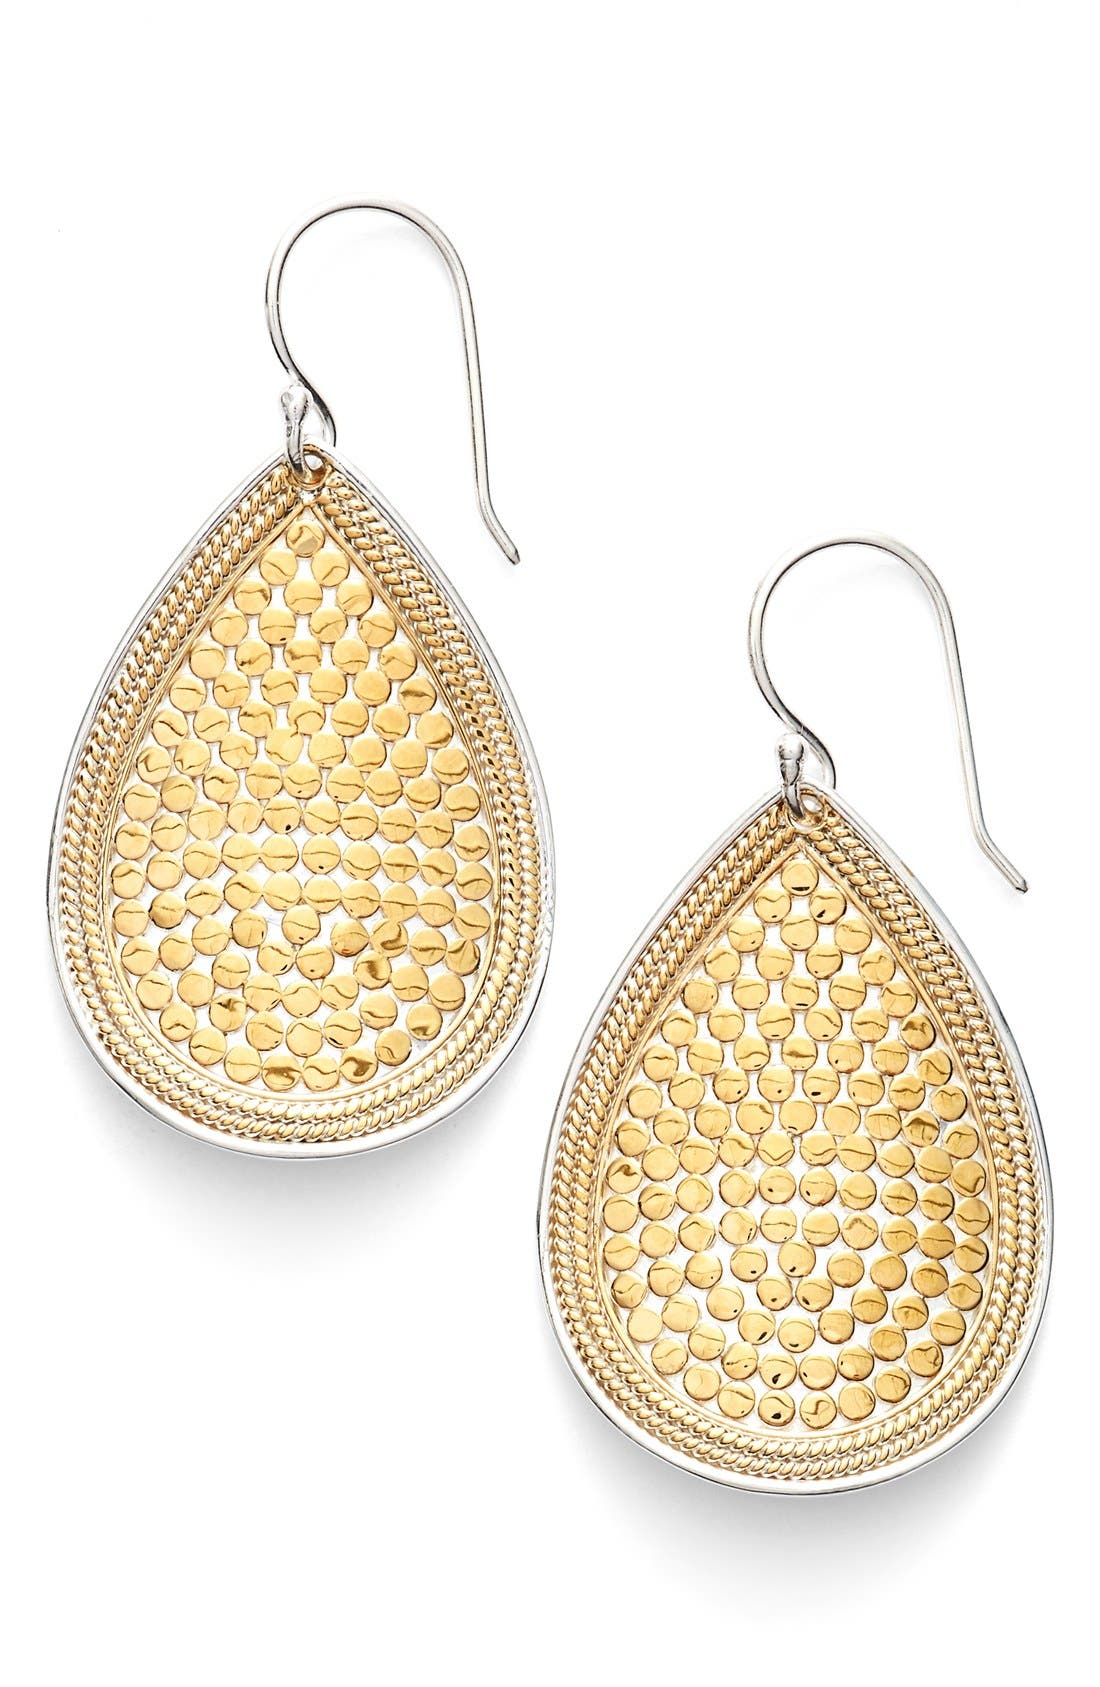 Main Image - Anna Beck Gili Teardrop Earrings